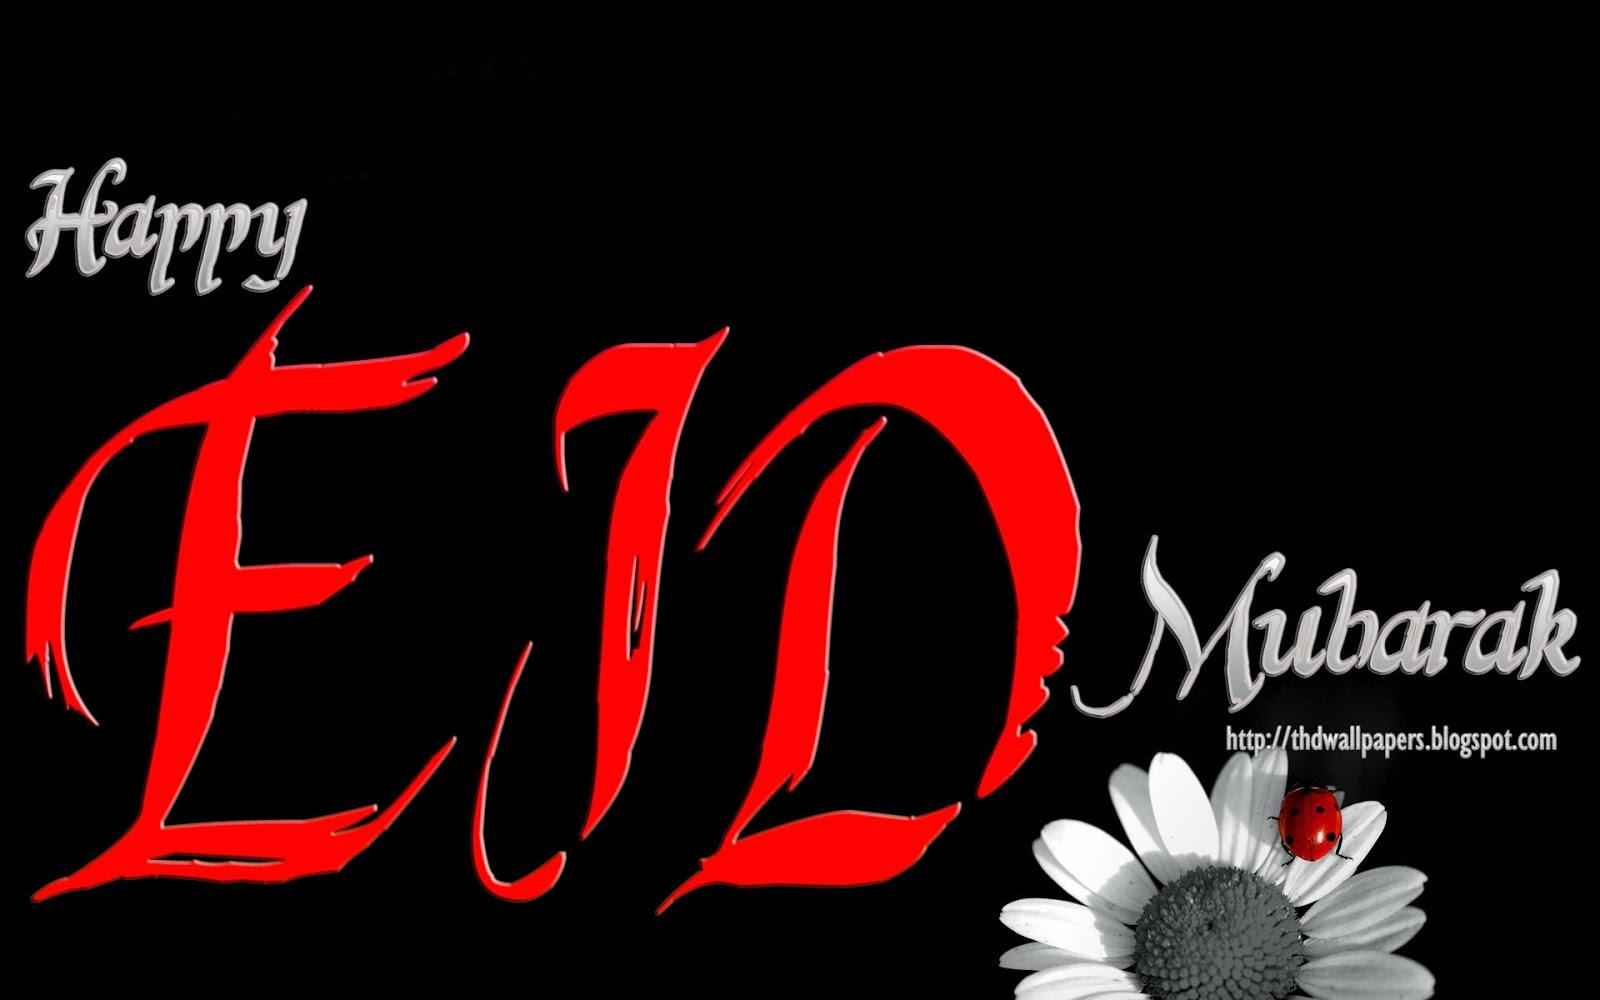 Eid ul adha mubarak greetings cards hd wallpapers free downloads eid ul adha mubarak greetings cards hd wallpapers for free download kristyandbryce Choice Image